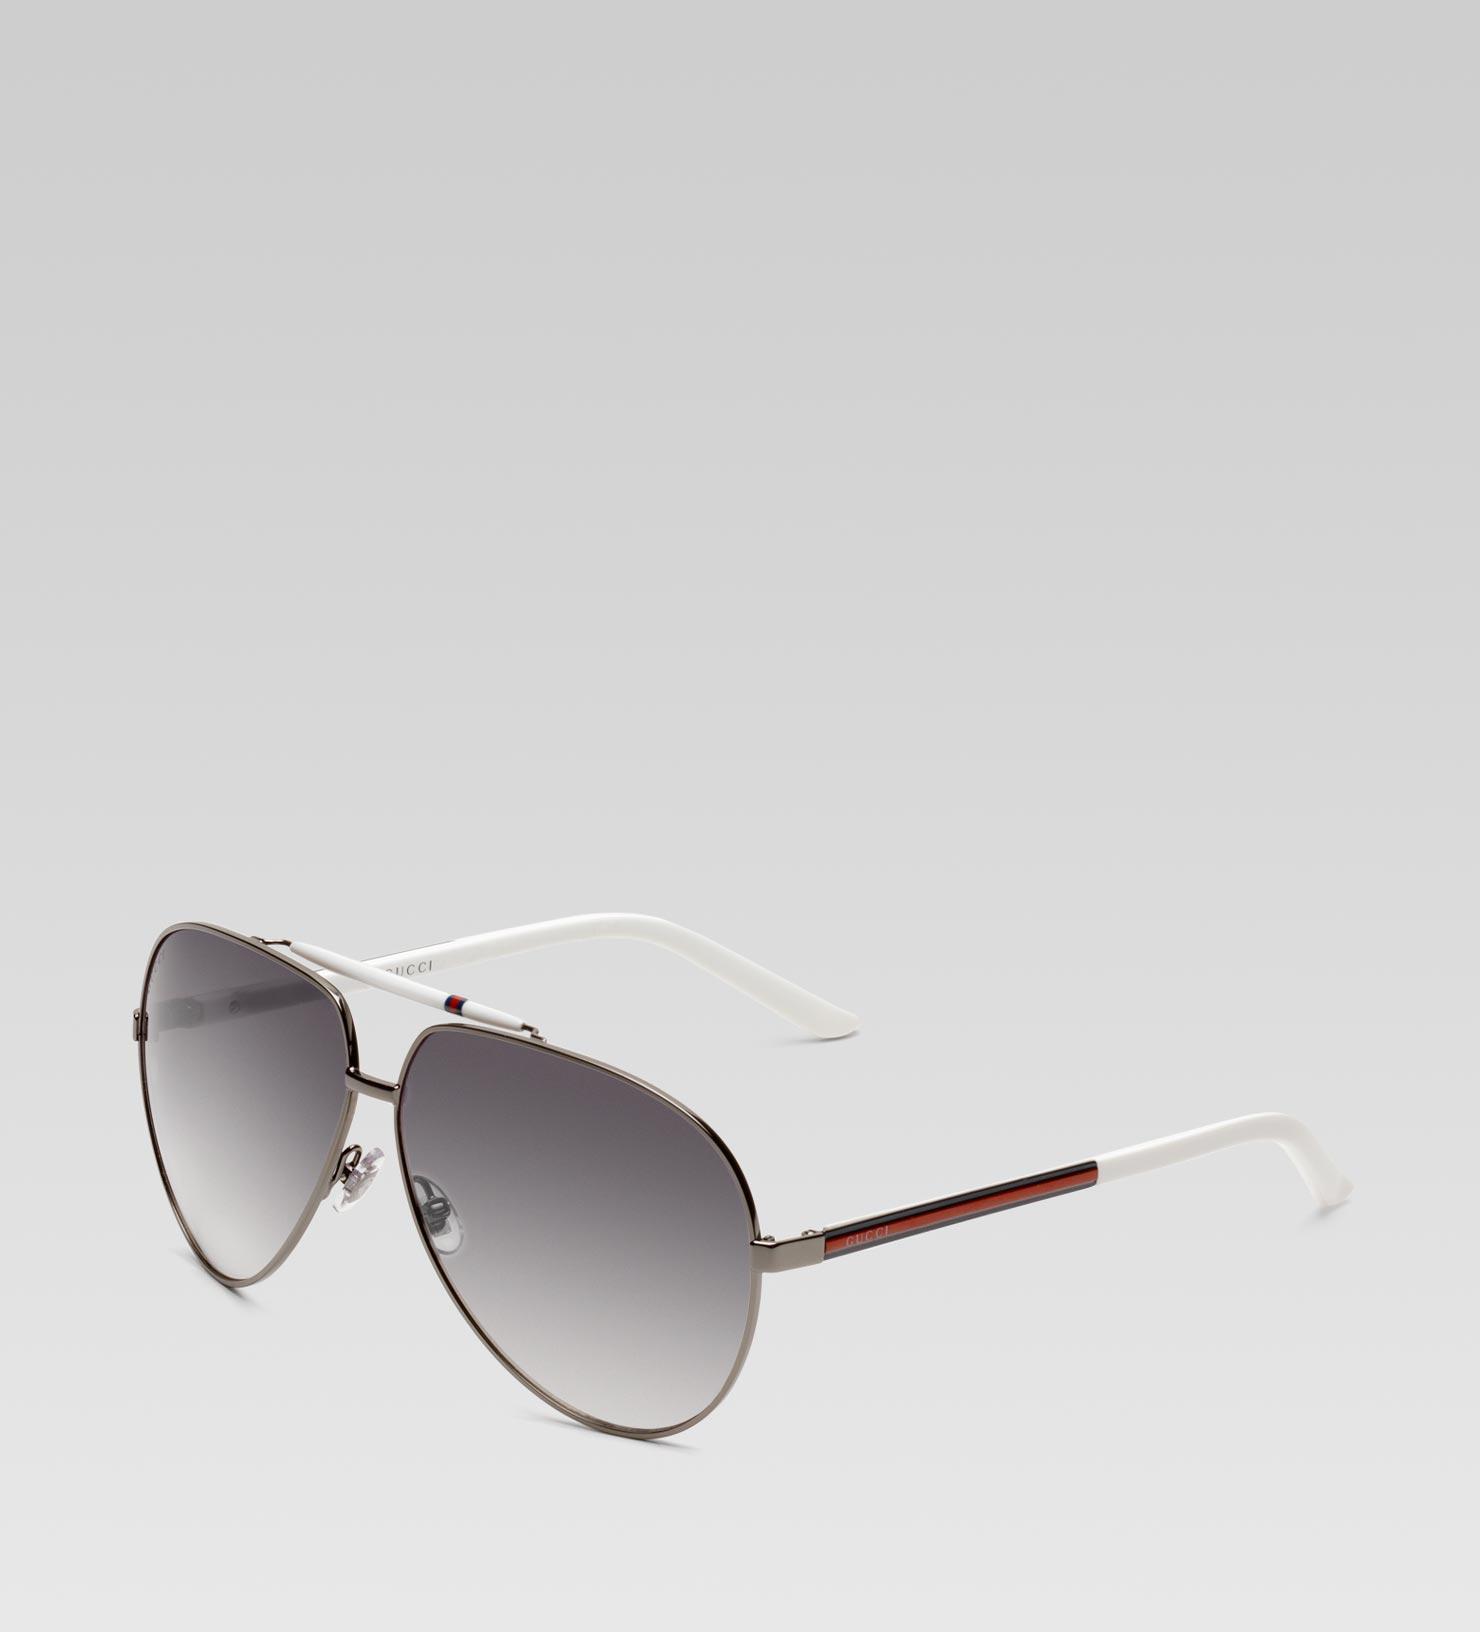 c869562f88 Gucci Medium Aviator Sunglasses With Signature Web Detail On Temple ...